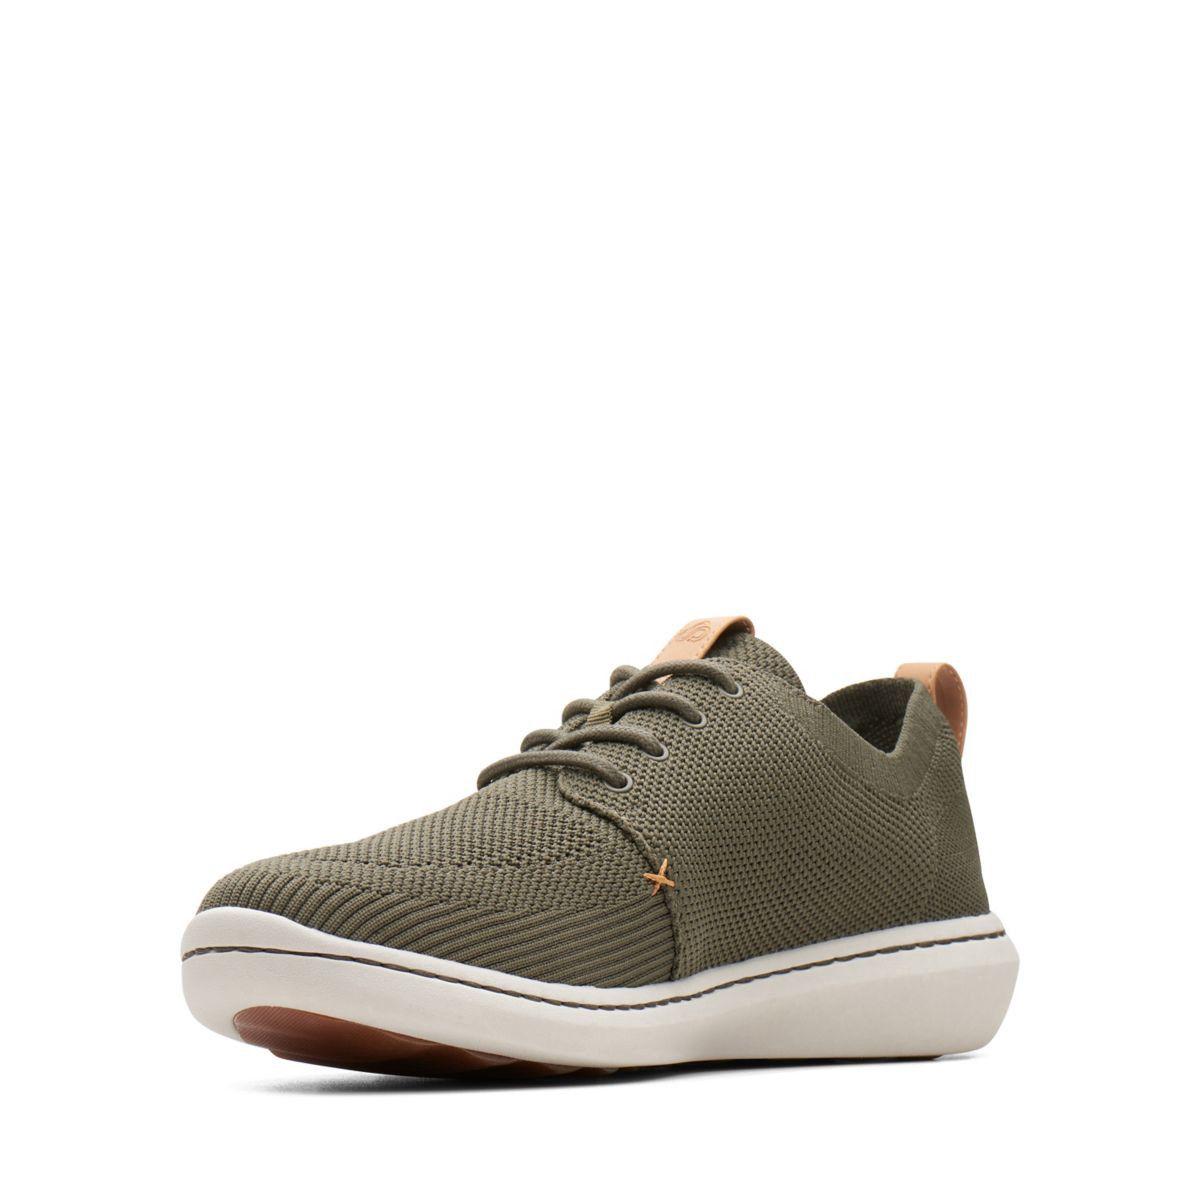 Clarks Step Urban Mix - Mens Shoes Khaki 10.5 390613172